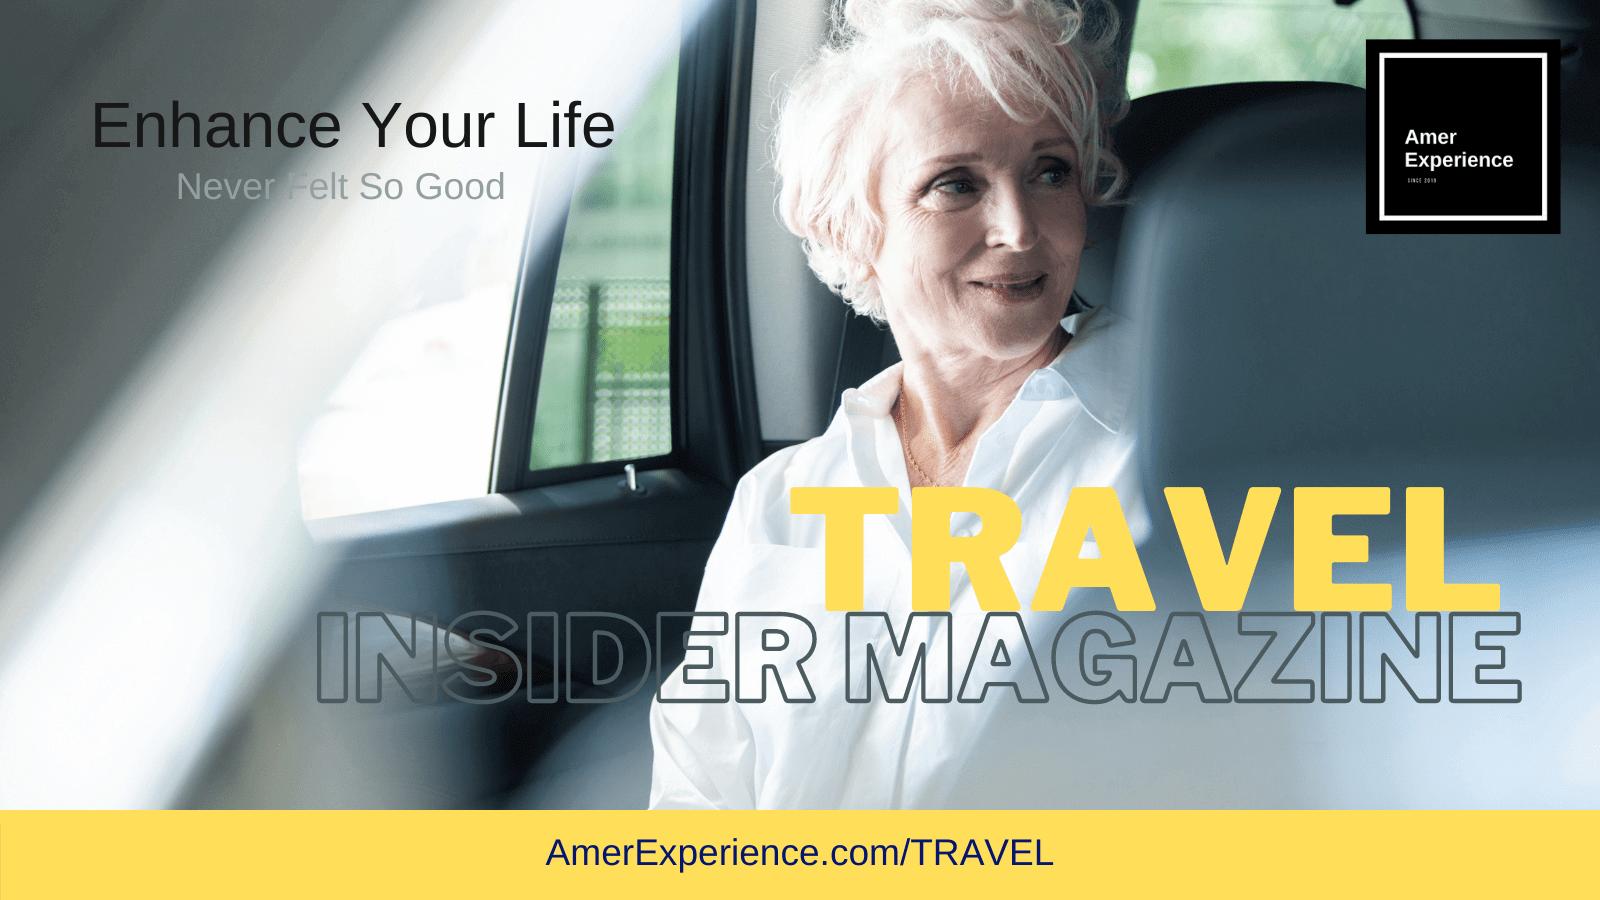 Travel Insider Magazine AmerExperience